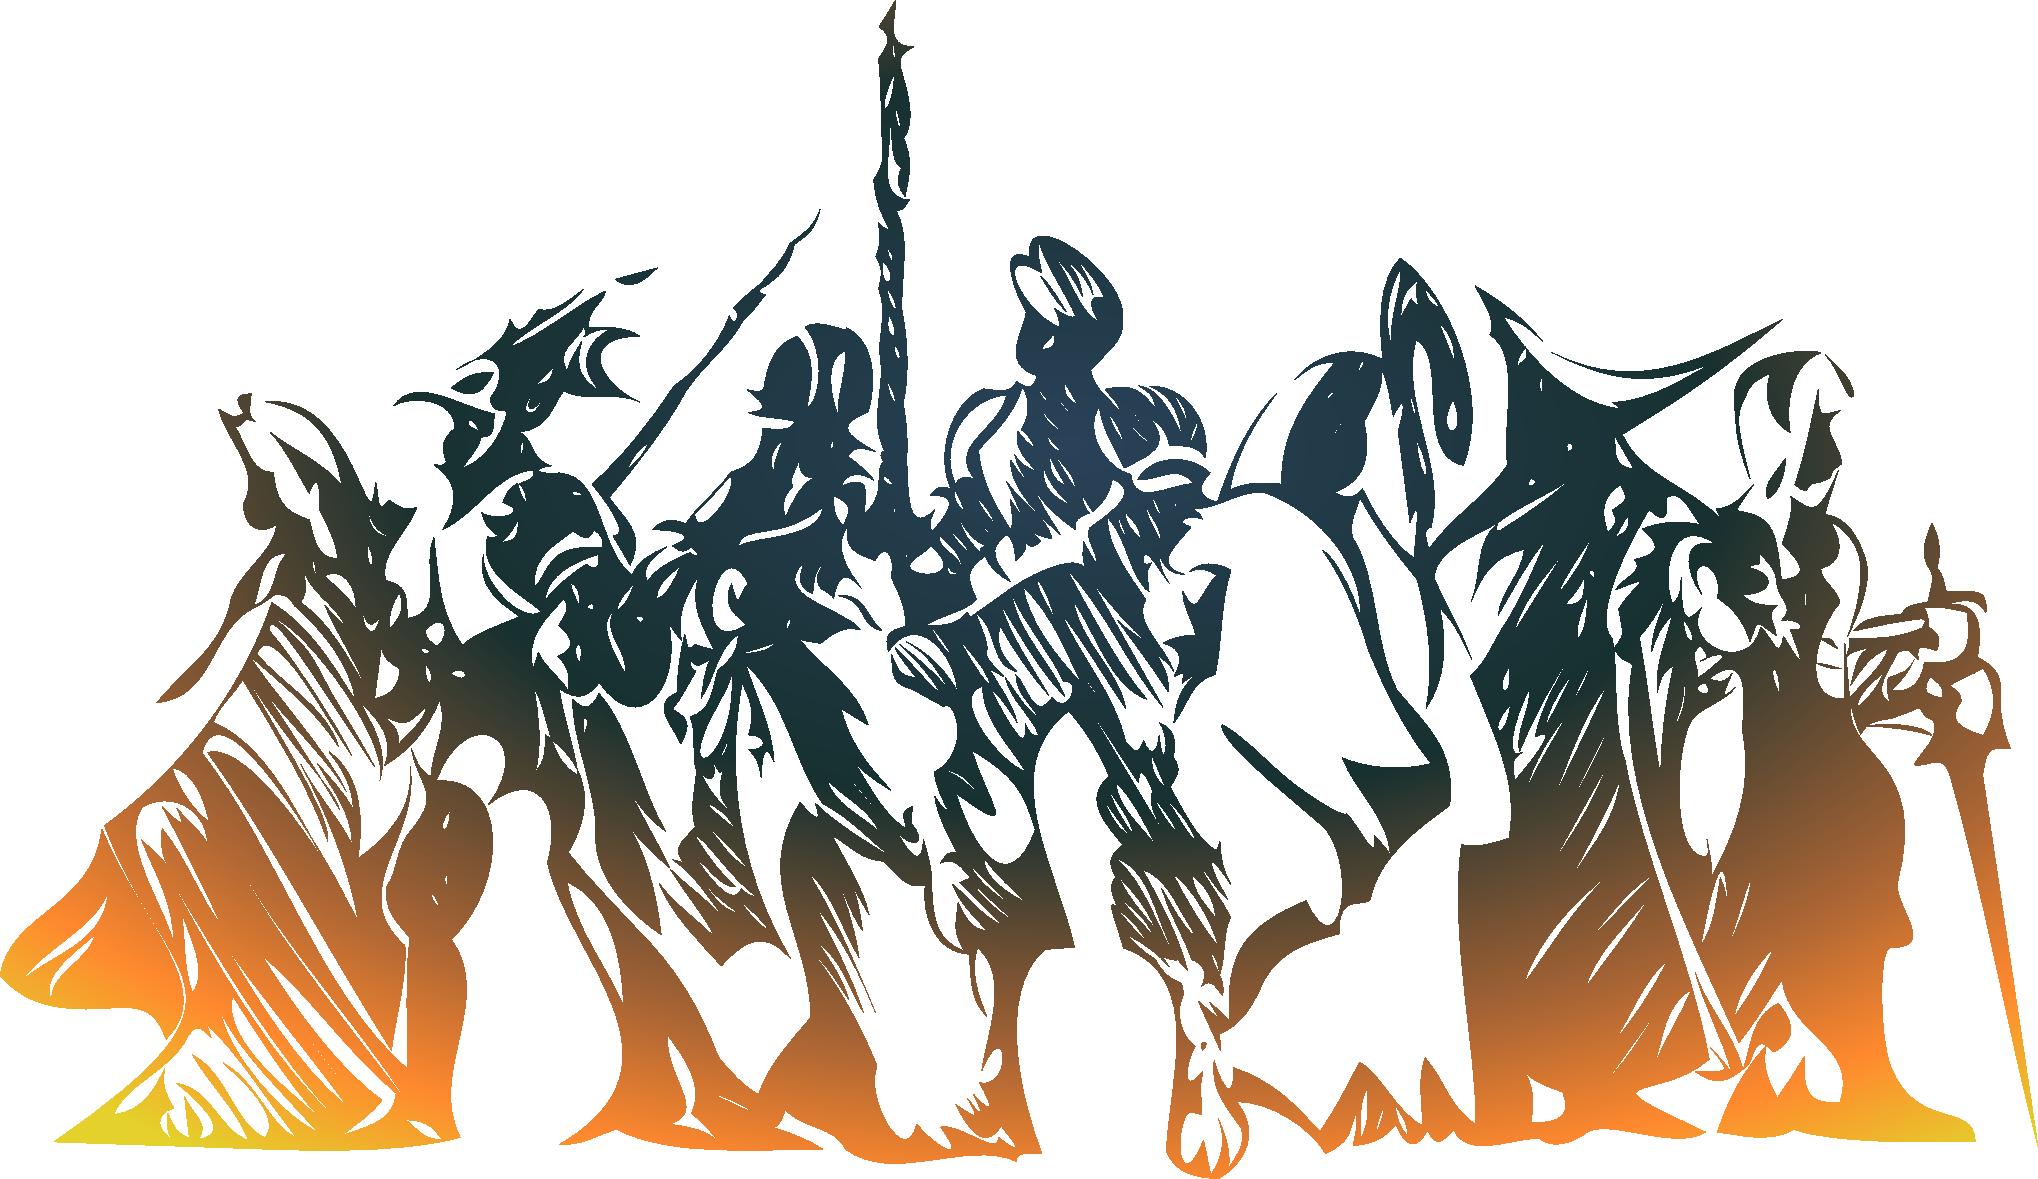 Final fantasy logo art - photo#22